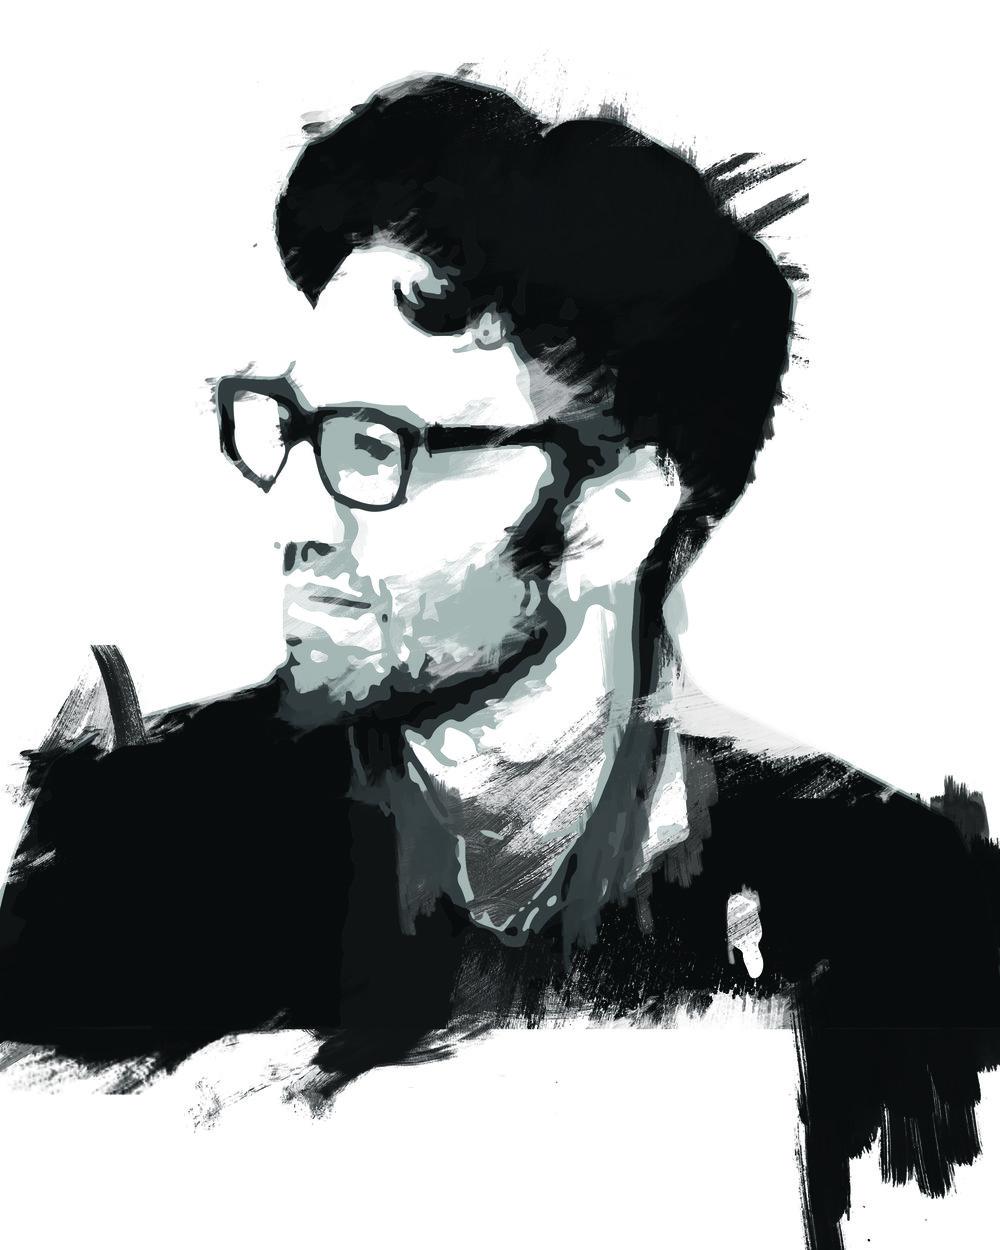 Jason Oliva, NYC artist